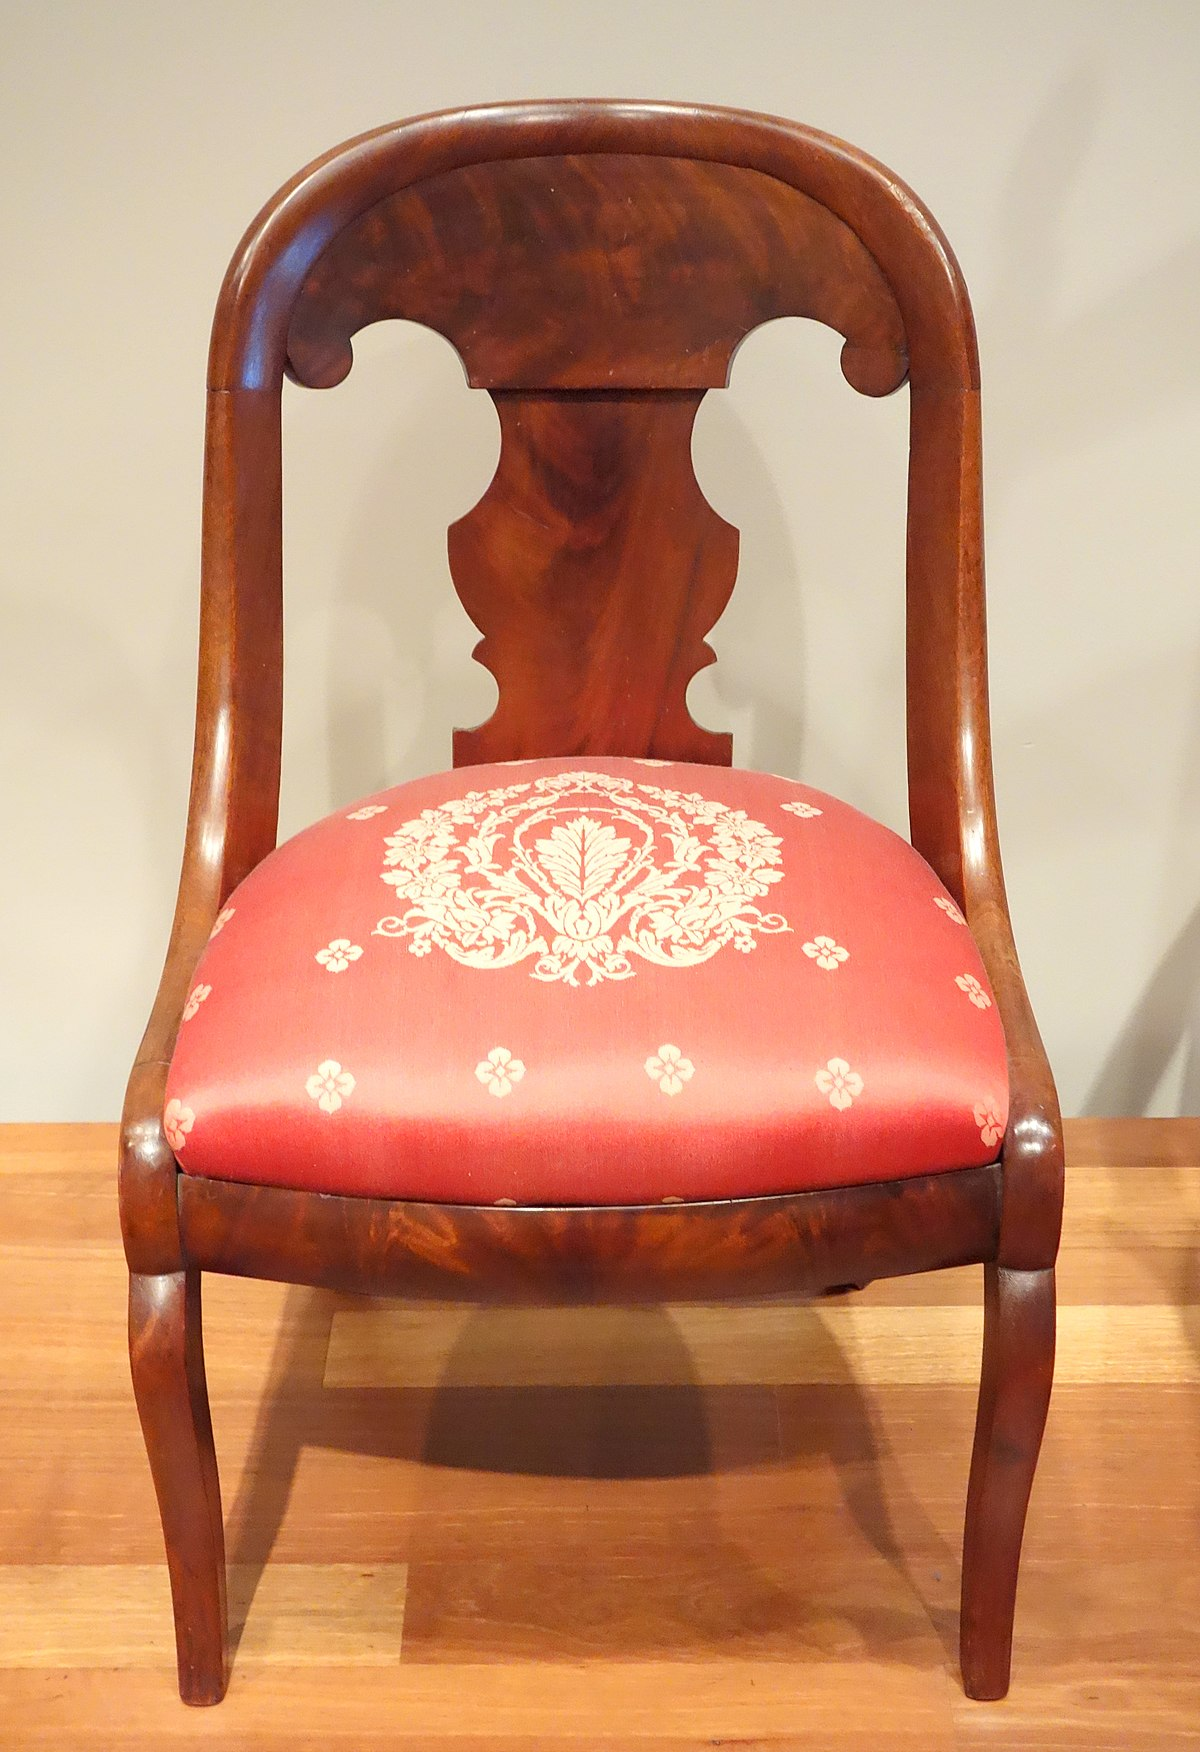 Gondola chair wikipedia